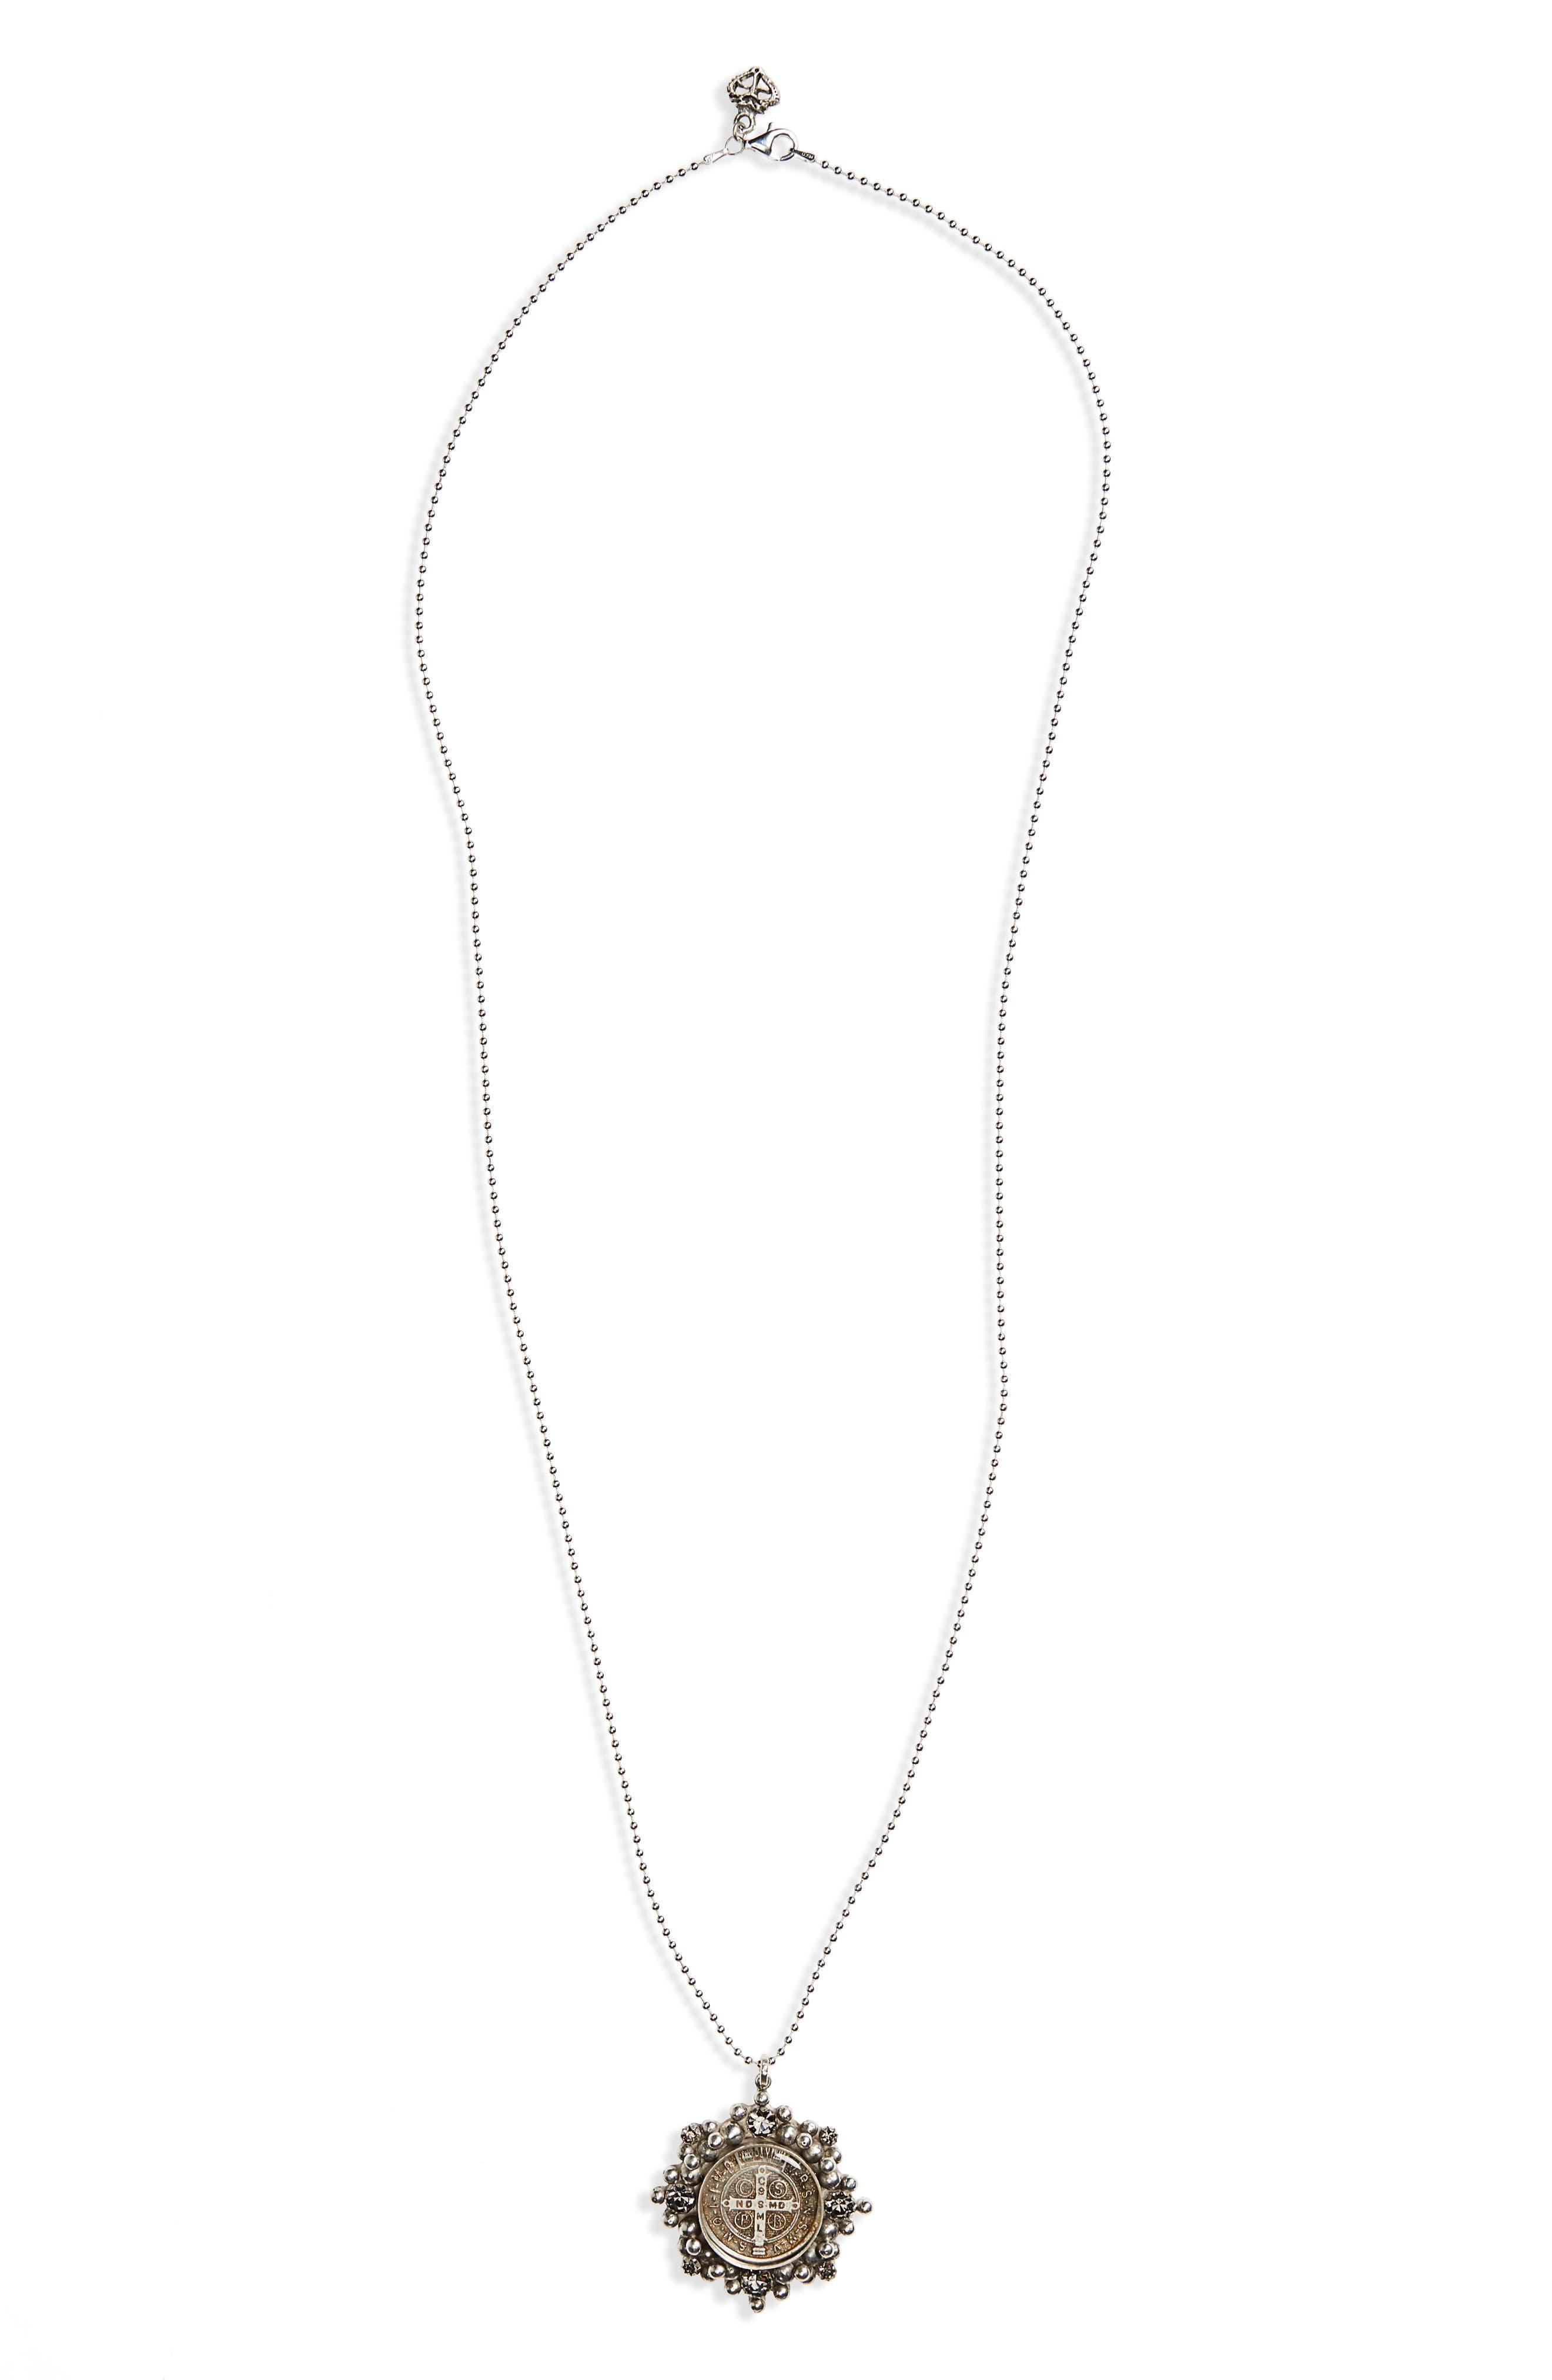 Cloister Cross Pendant Necklace,                         Main,                         color, Silver/ Black Diamond